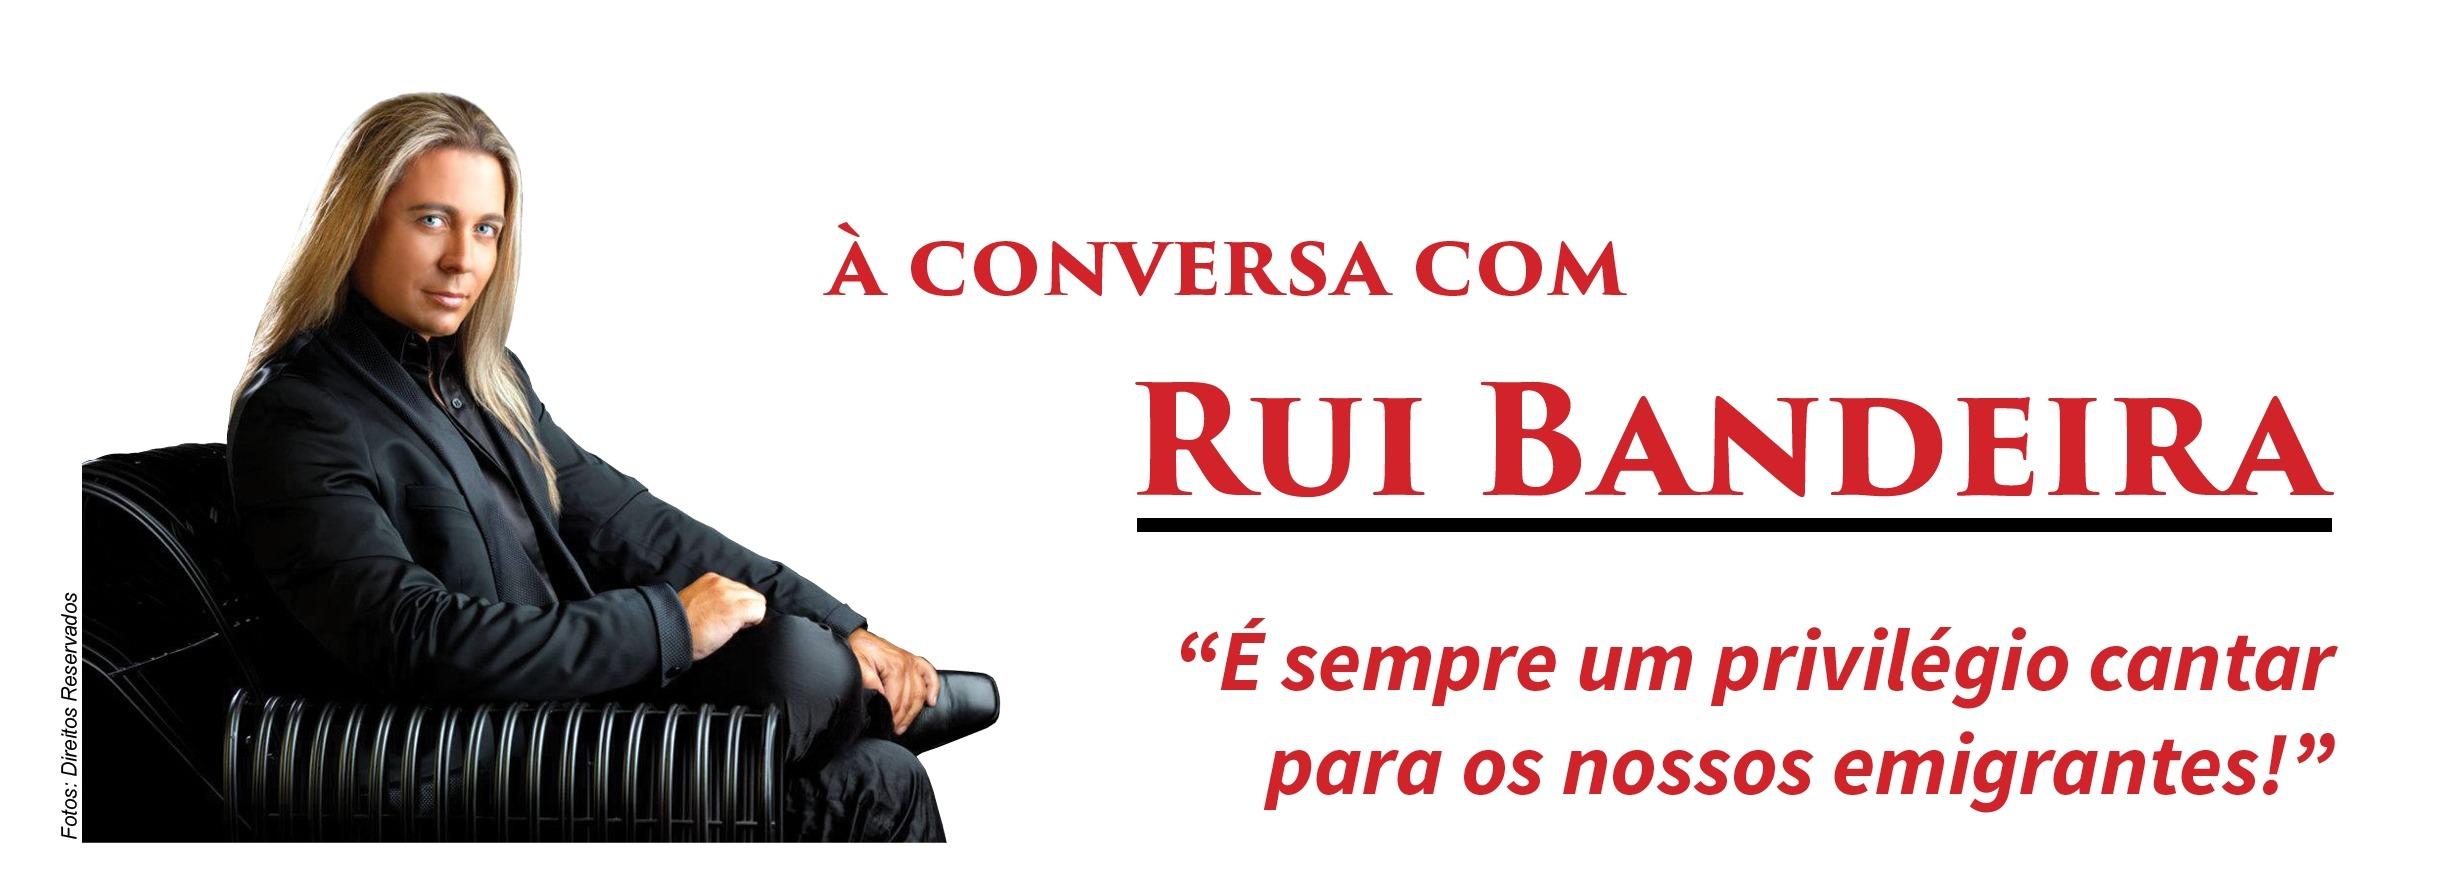 Rui Bandeira net worth